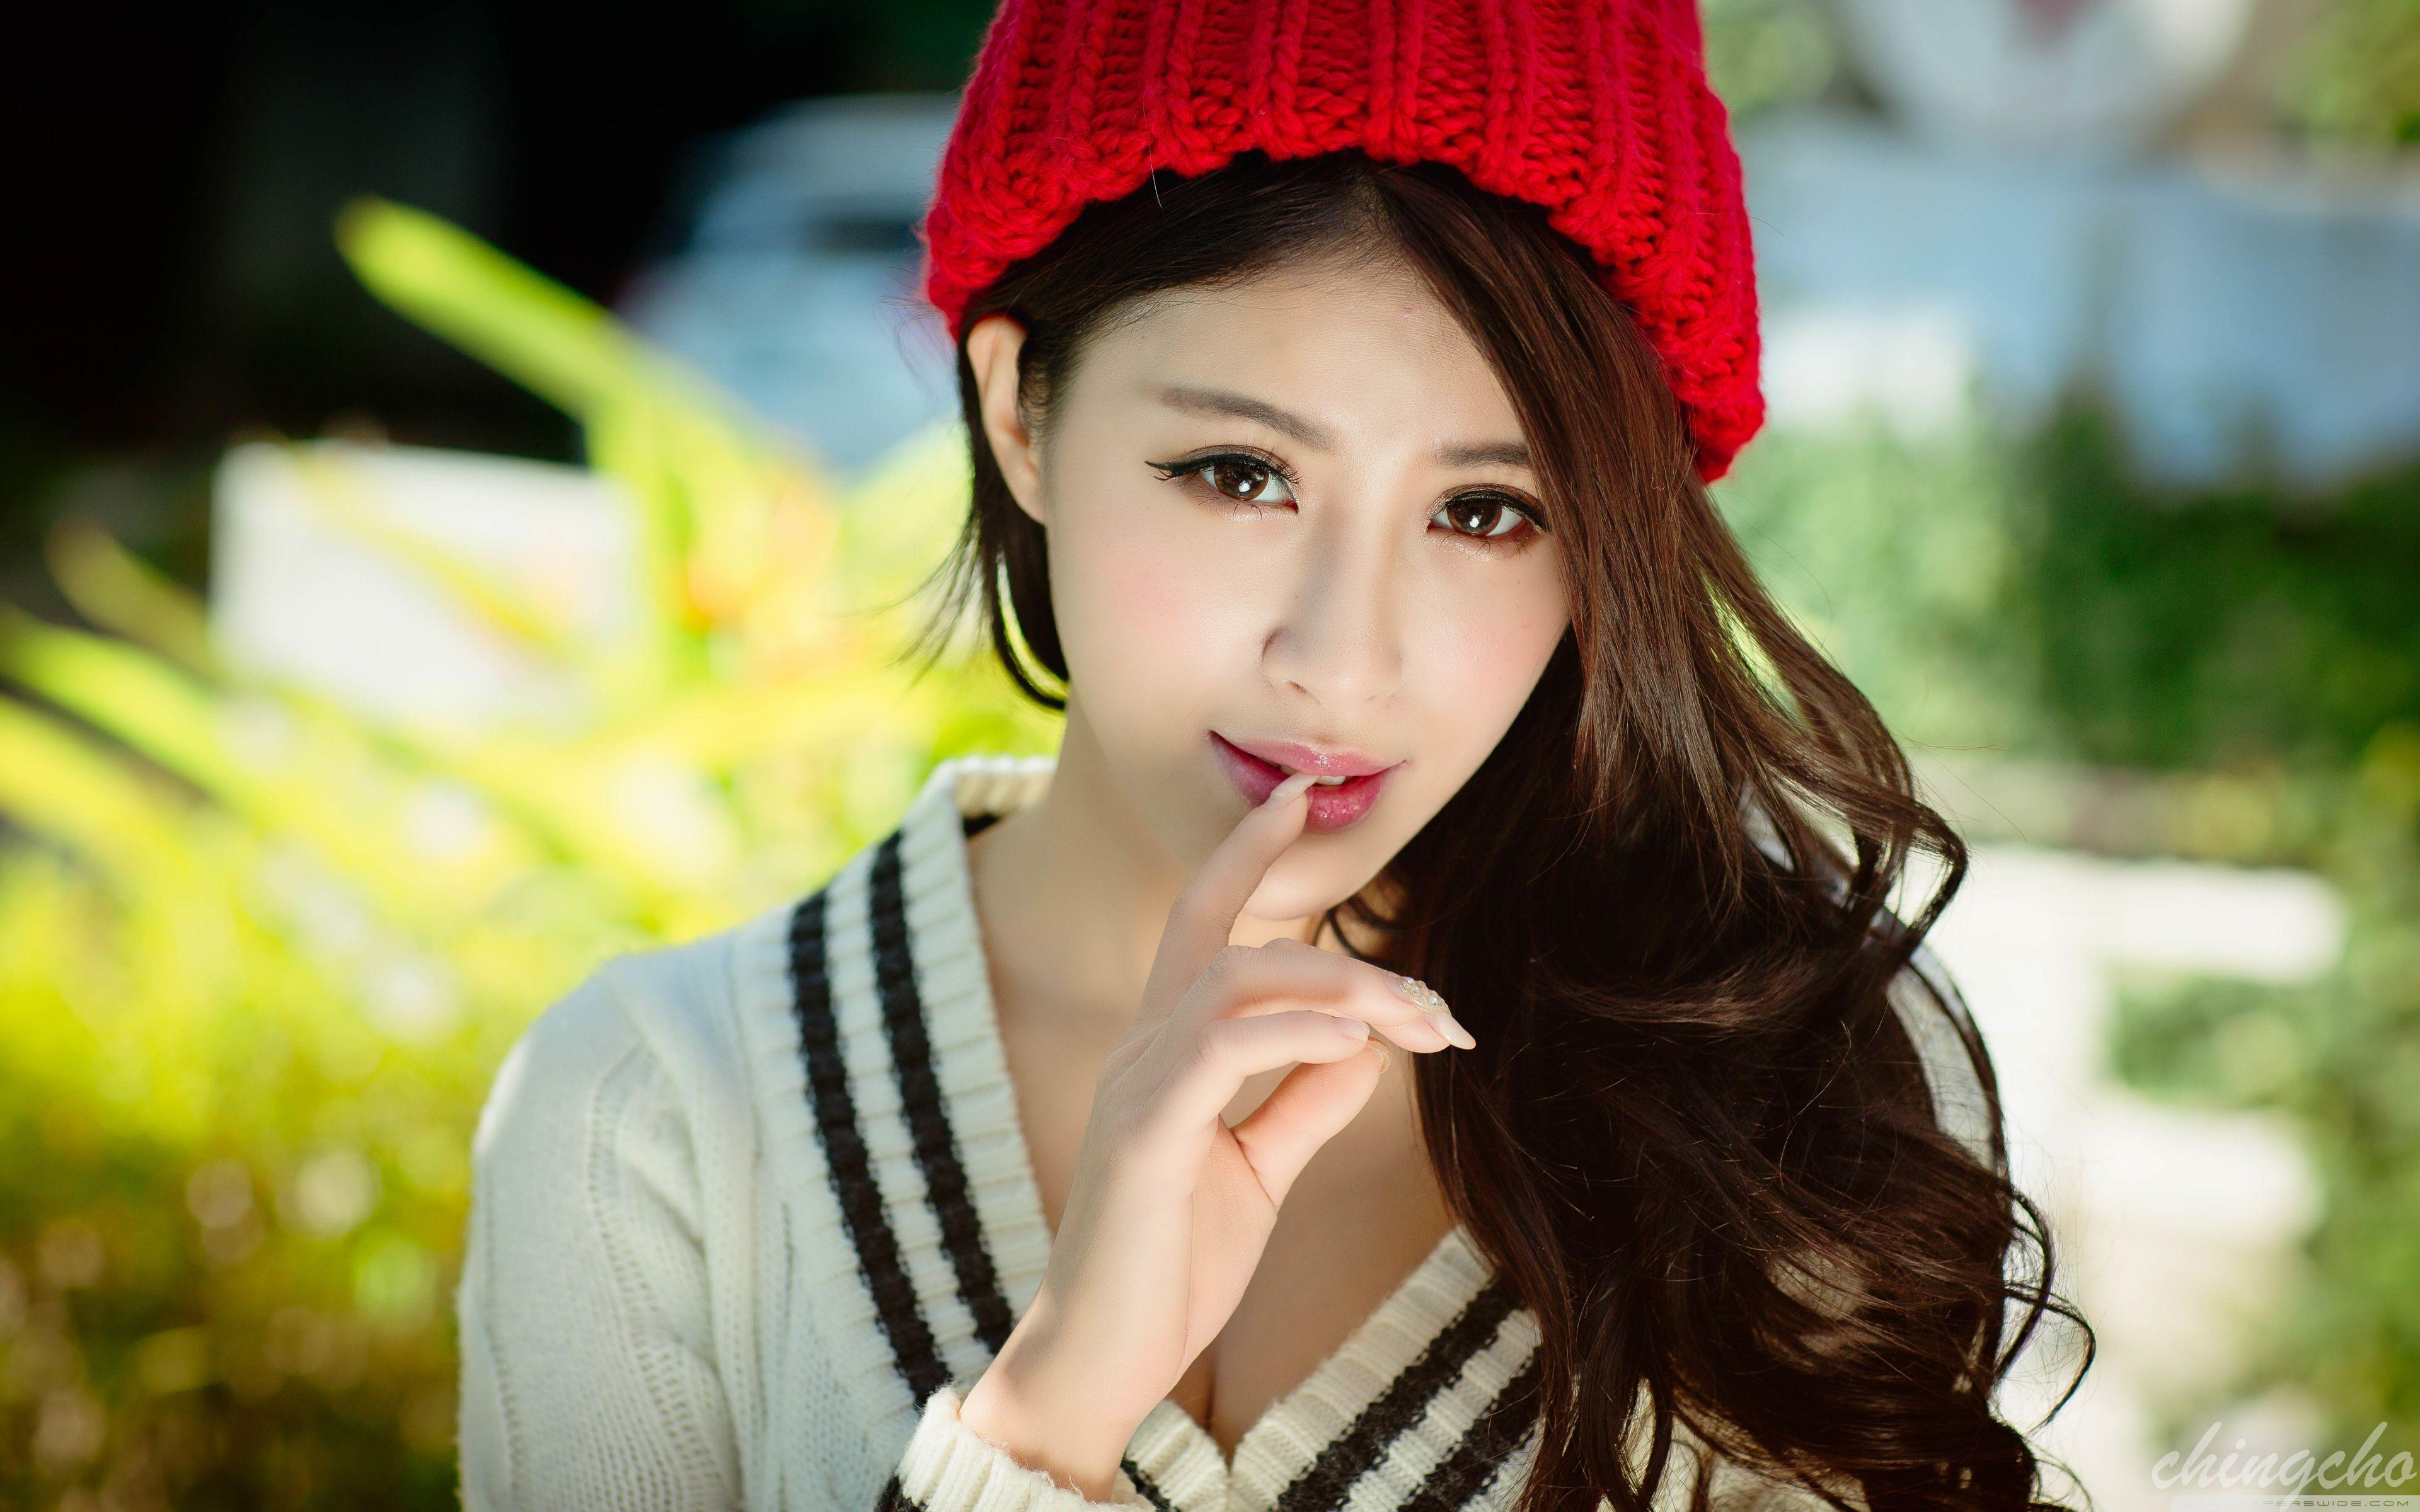 Chinese girl wallpapers wallpaper cave - Asian girl 4k ...